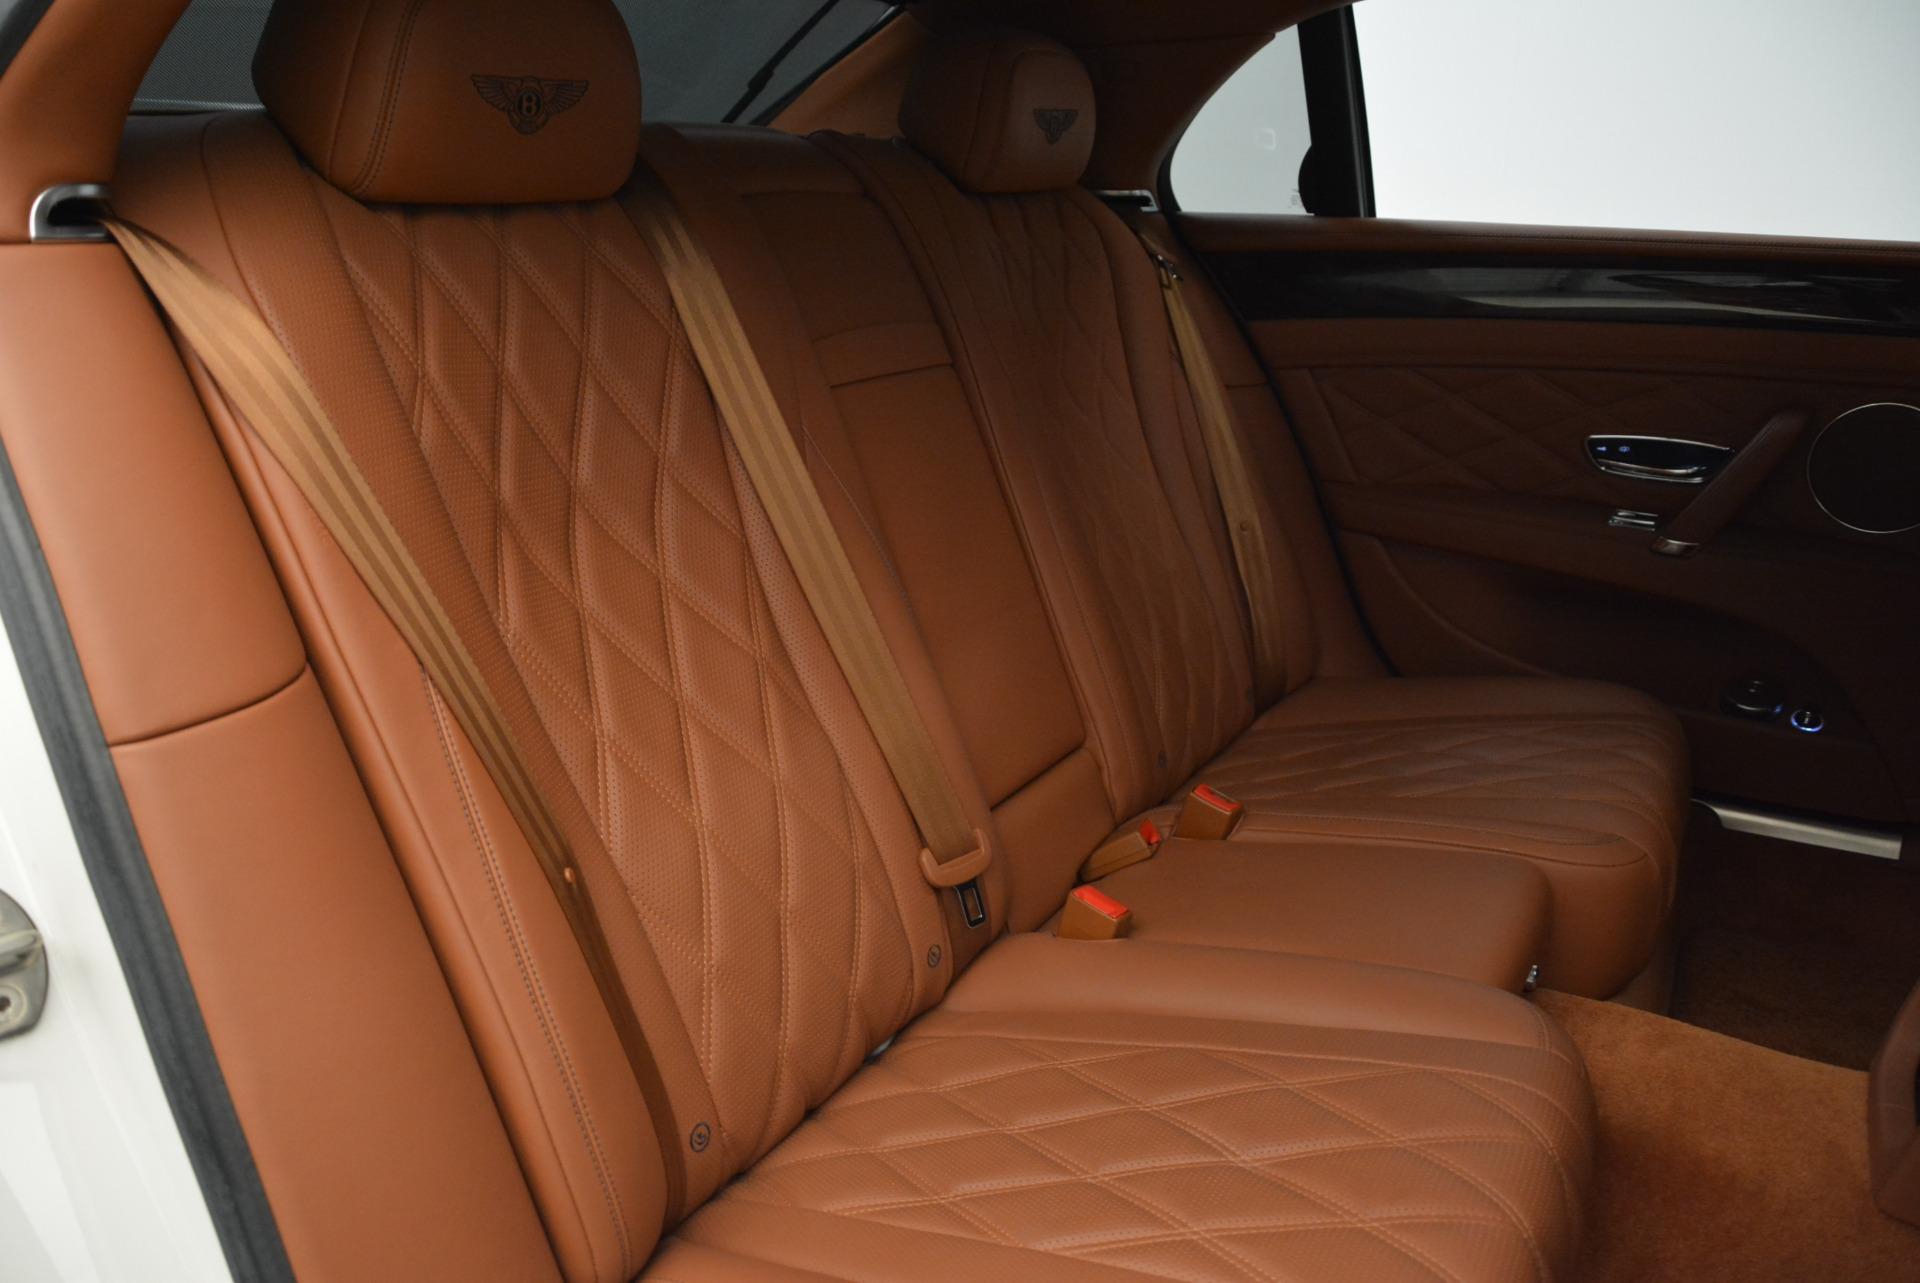 Used 2014 Bentley Flying Spur W12 For Sale In Westport, CT 1906_p39